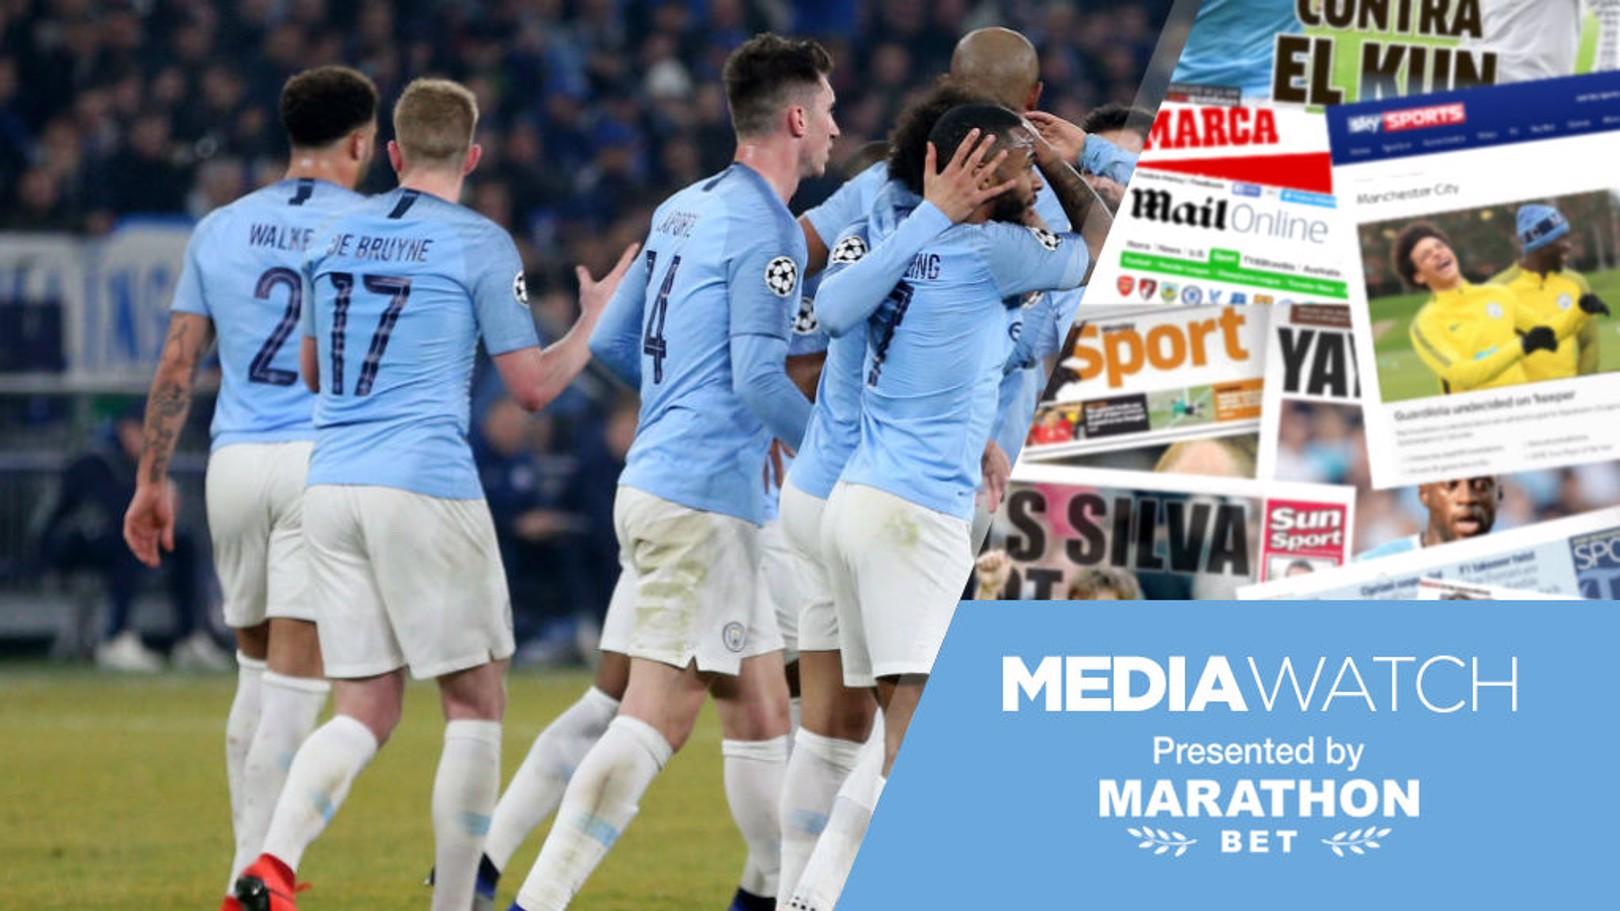 MEDIA WATCH: City's performance in Germany has garnered praise